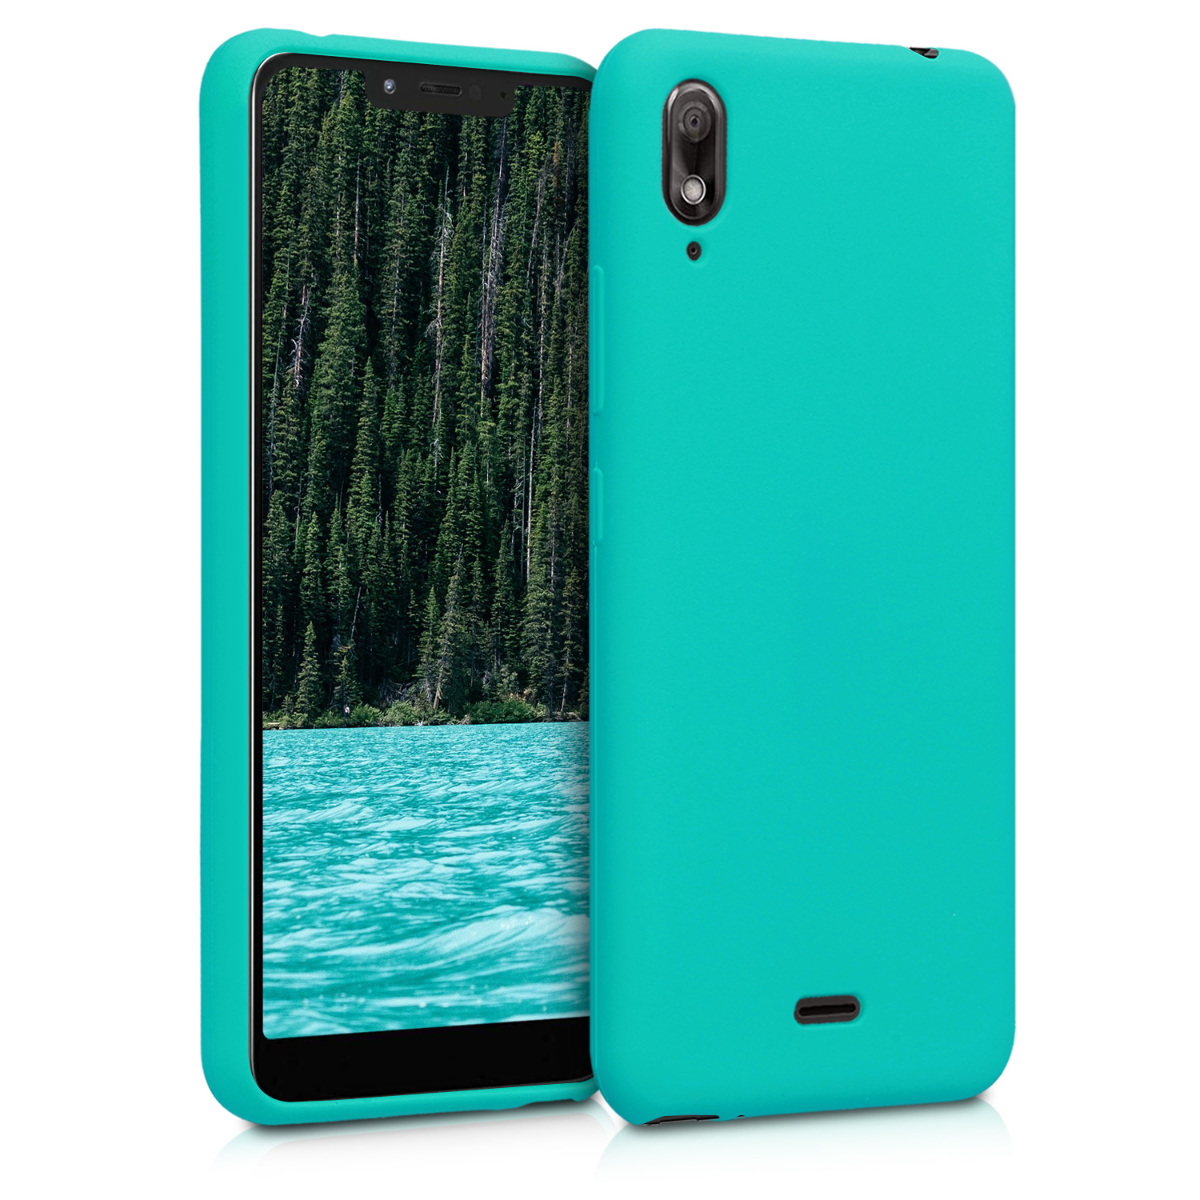 KW Θήκη Σιλικόνης Wiko View 2 Go - Neon Turquoise (47774.126)